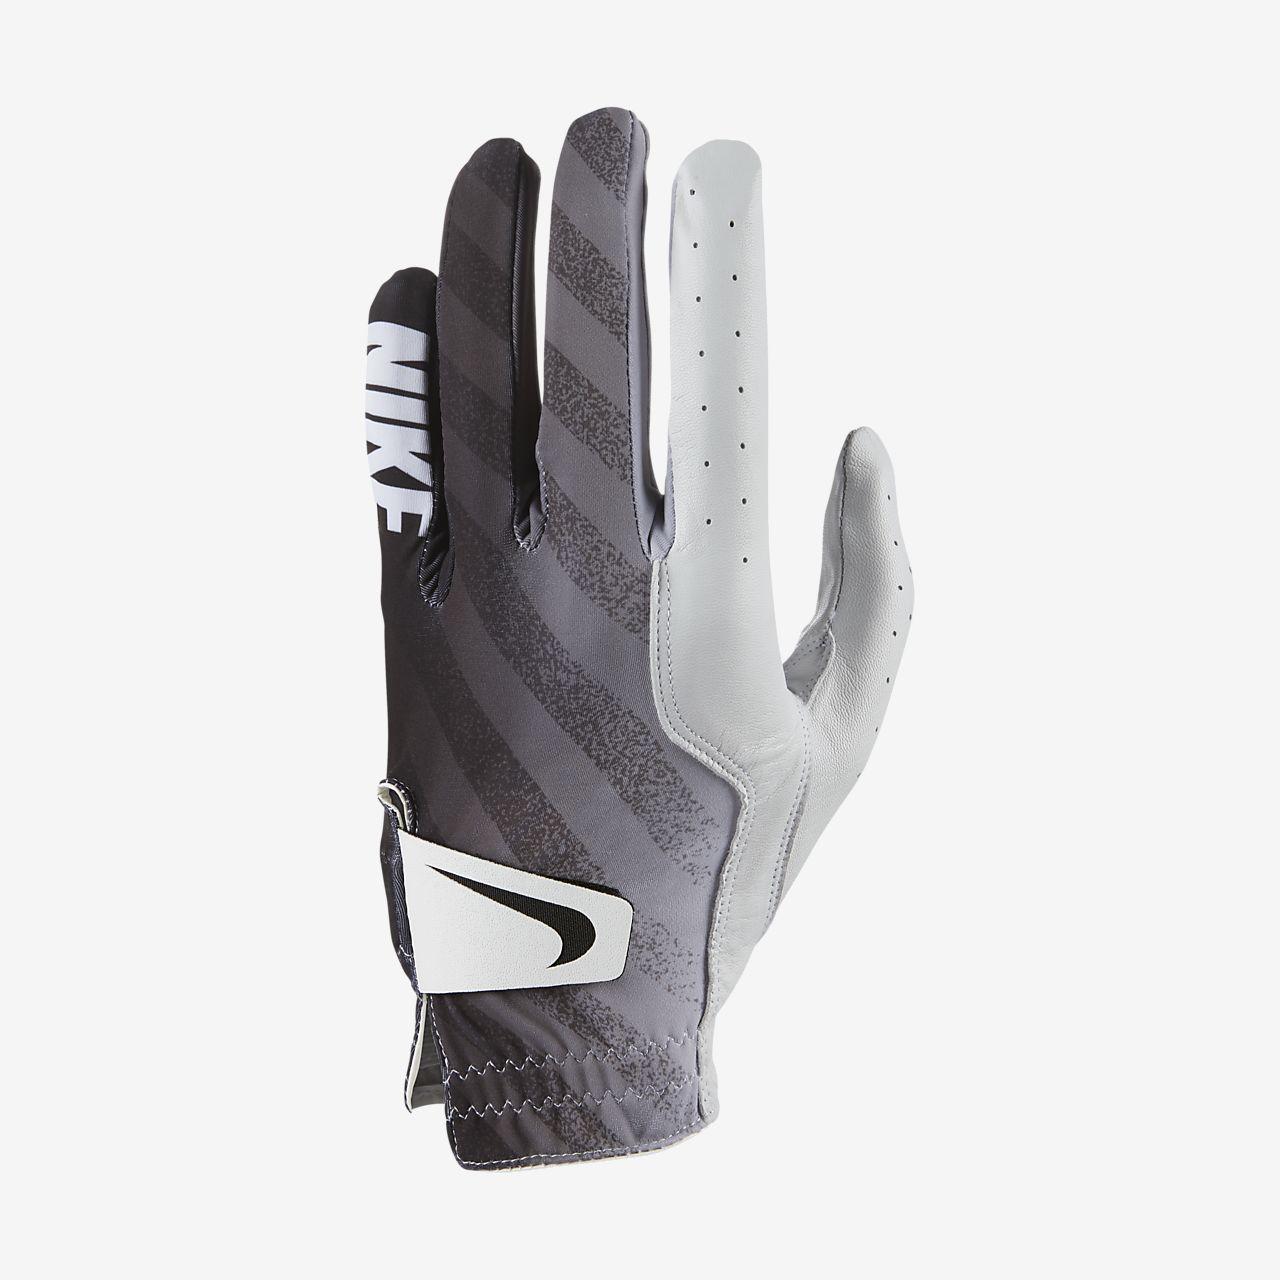 Guanto da golf Nike Tech - Uomo (Mano sinistra/Regular fit)